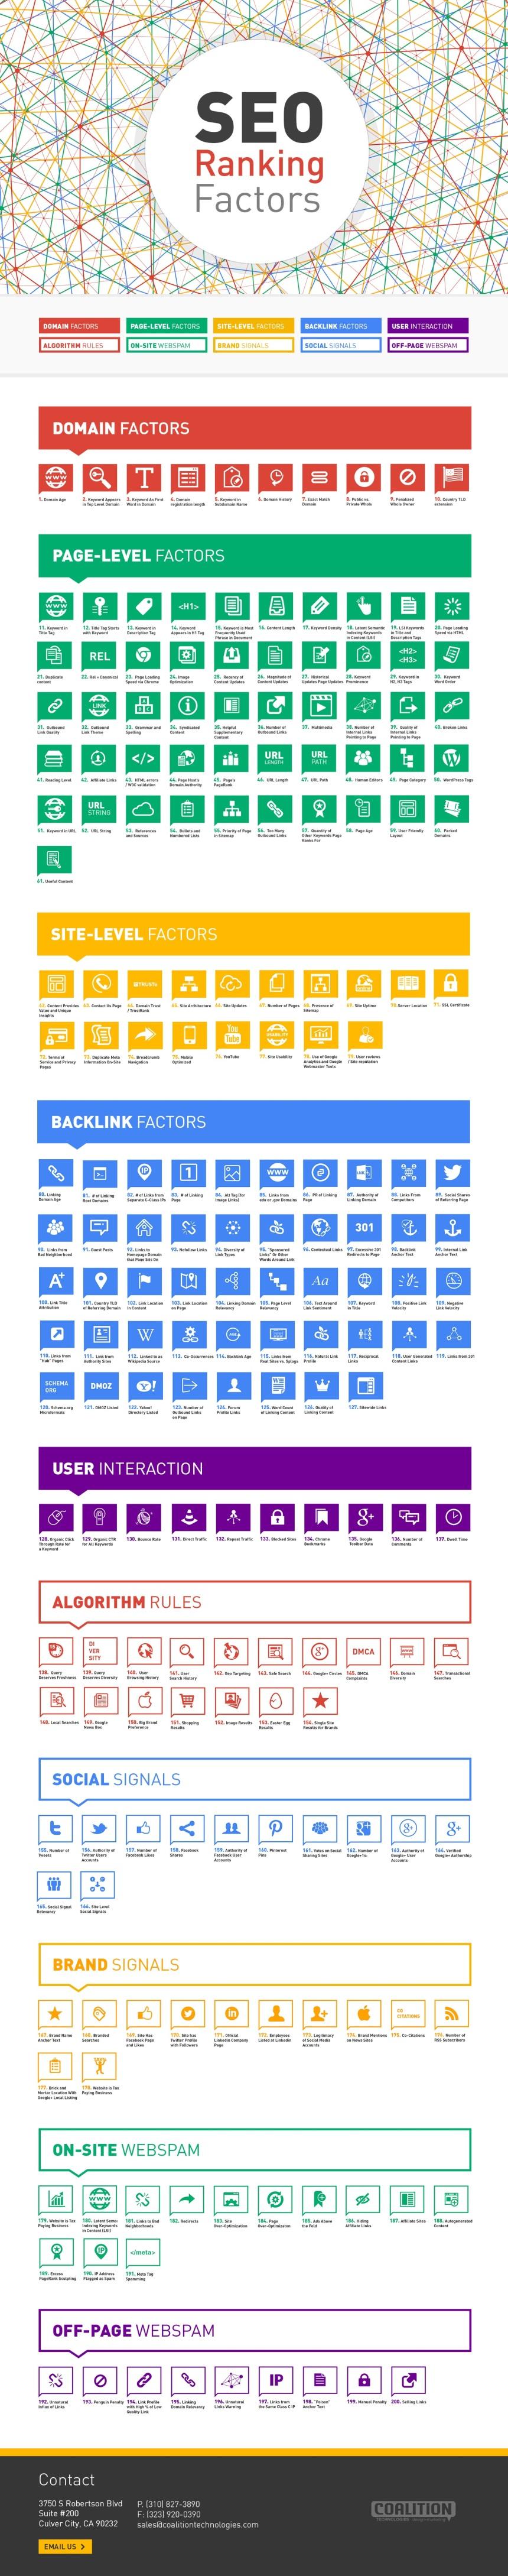 200 factores que contribuyen al ranking SEO